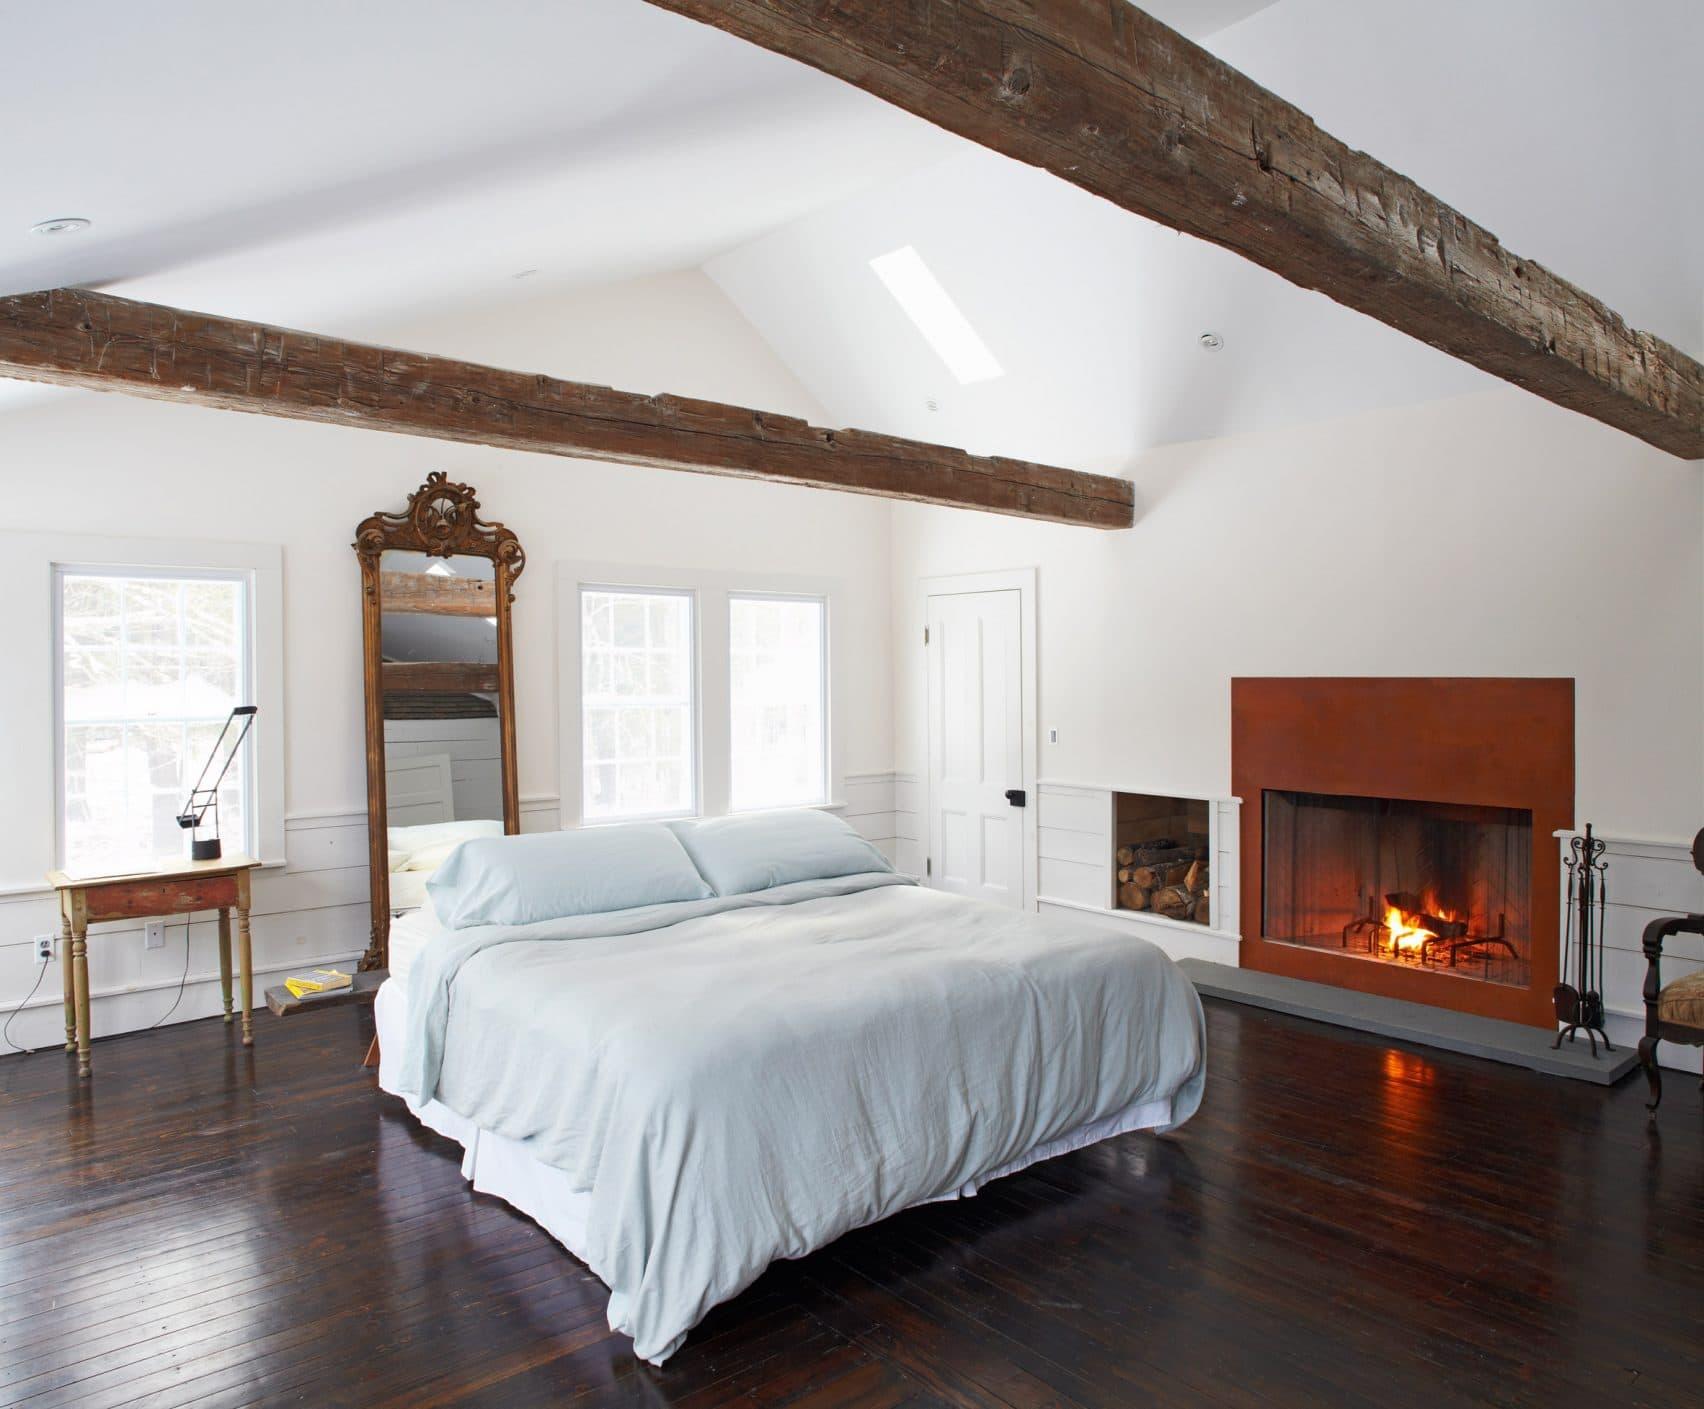 floating farmhouse tom givone residential renovations new york usa dezeen 2364 col 4 1704x1409 1